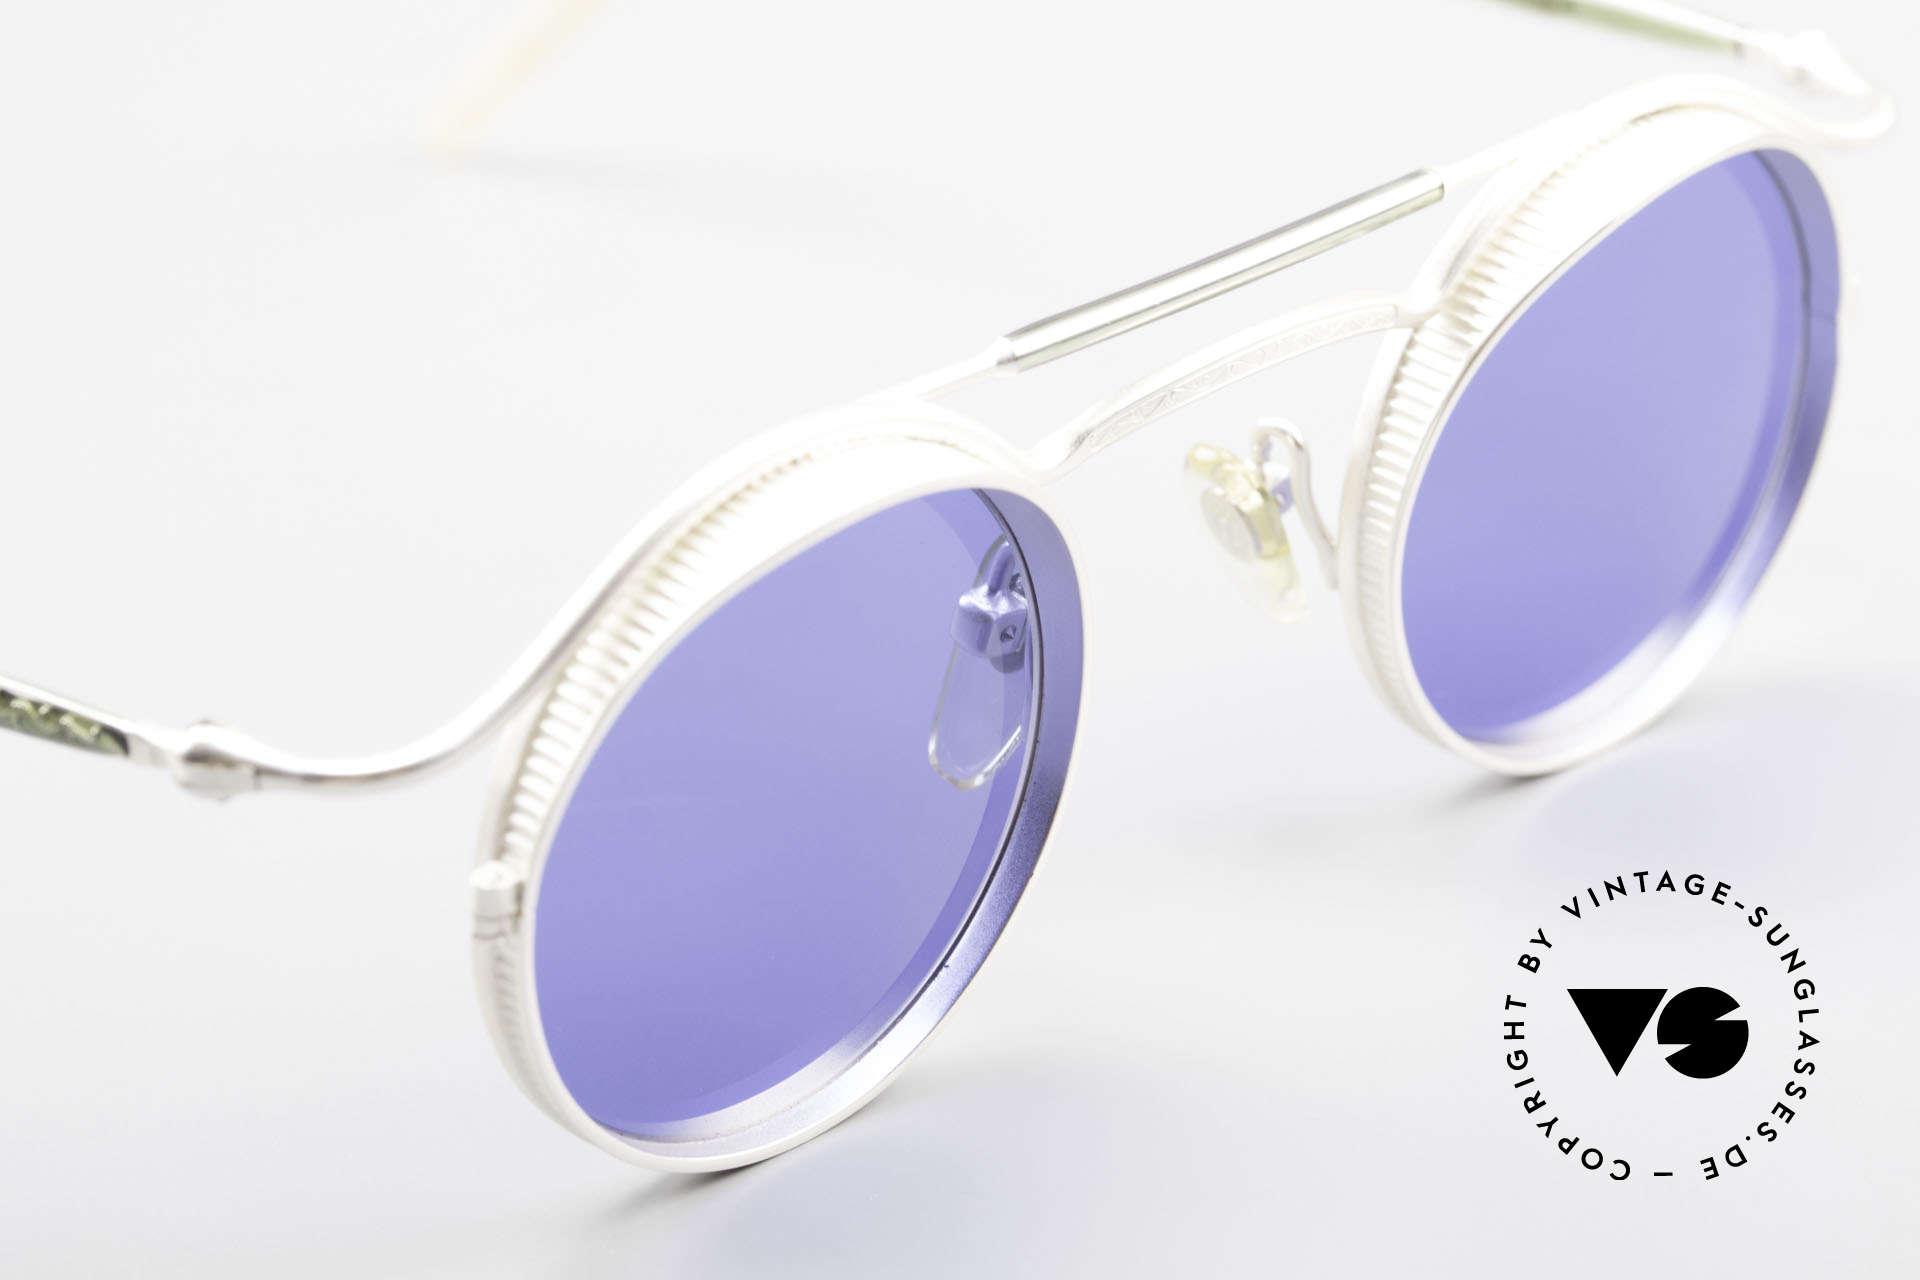 Matsuda 2903 Steampunk Sunglasses 90's, true vintage designer piece and NO RETRO reproduction, Made for Men and Women